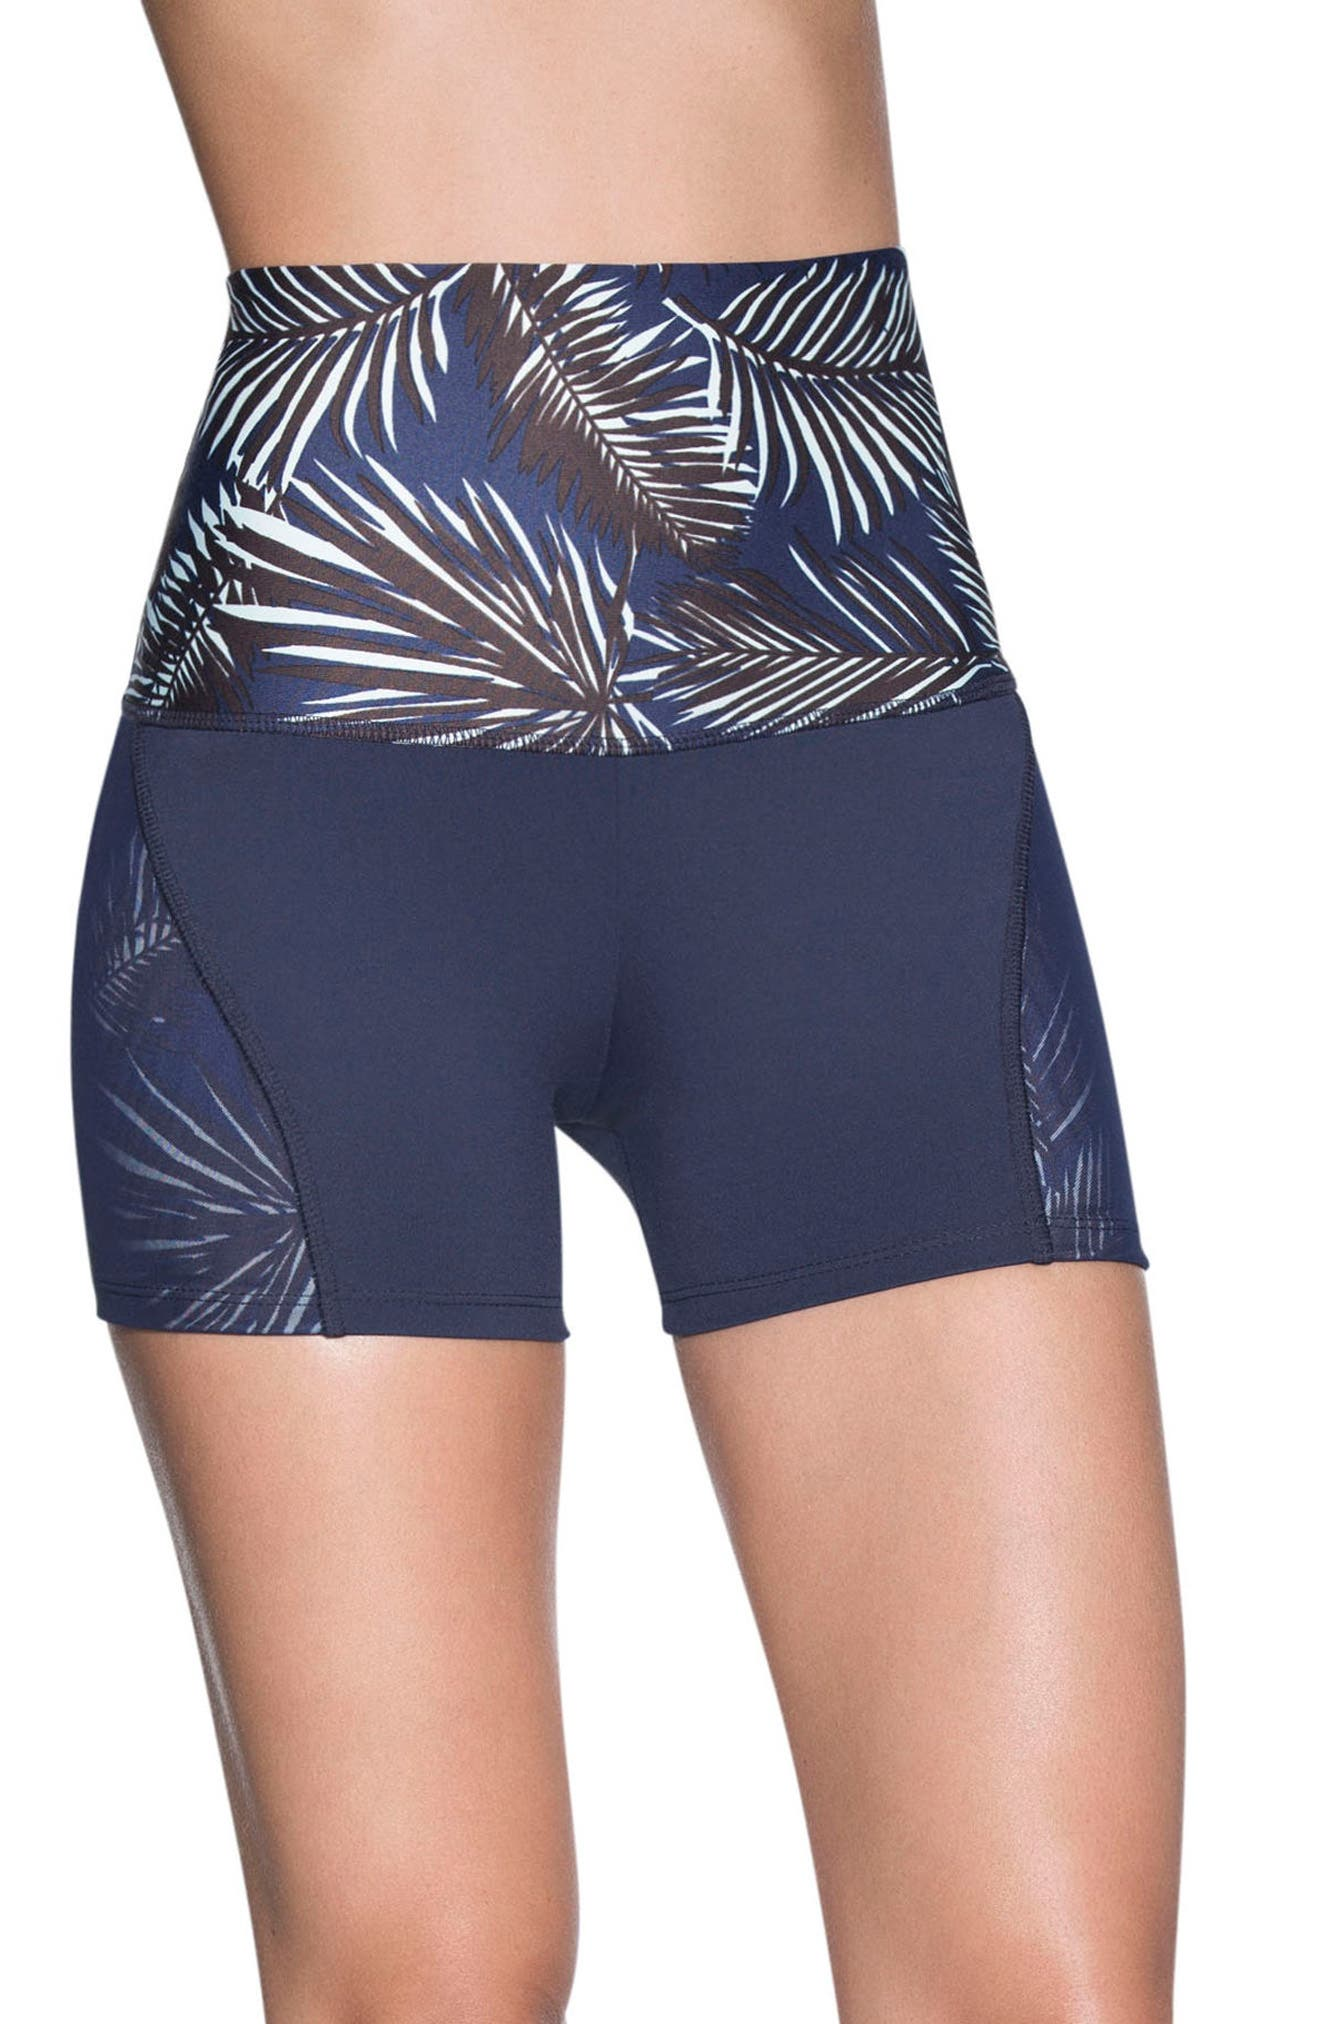 Cobra High Waist Shorts,                             Main thumbnail 1, color,                             431